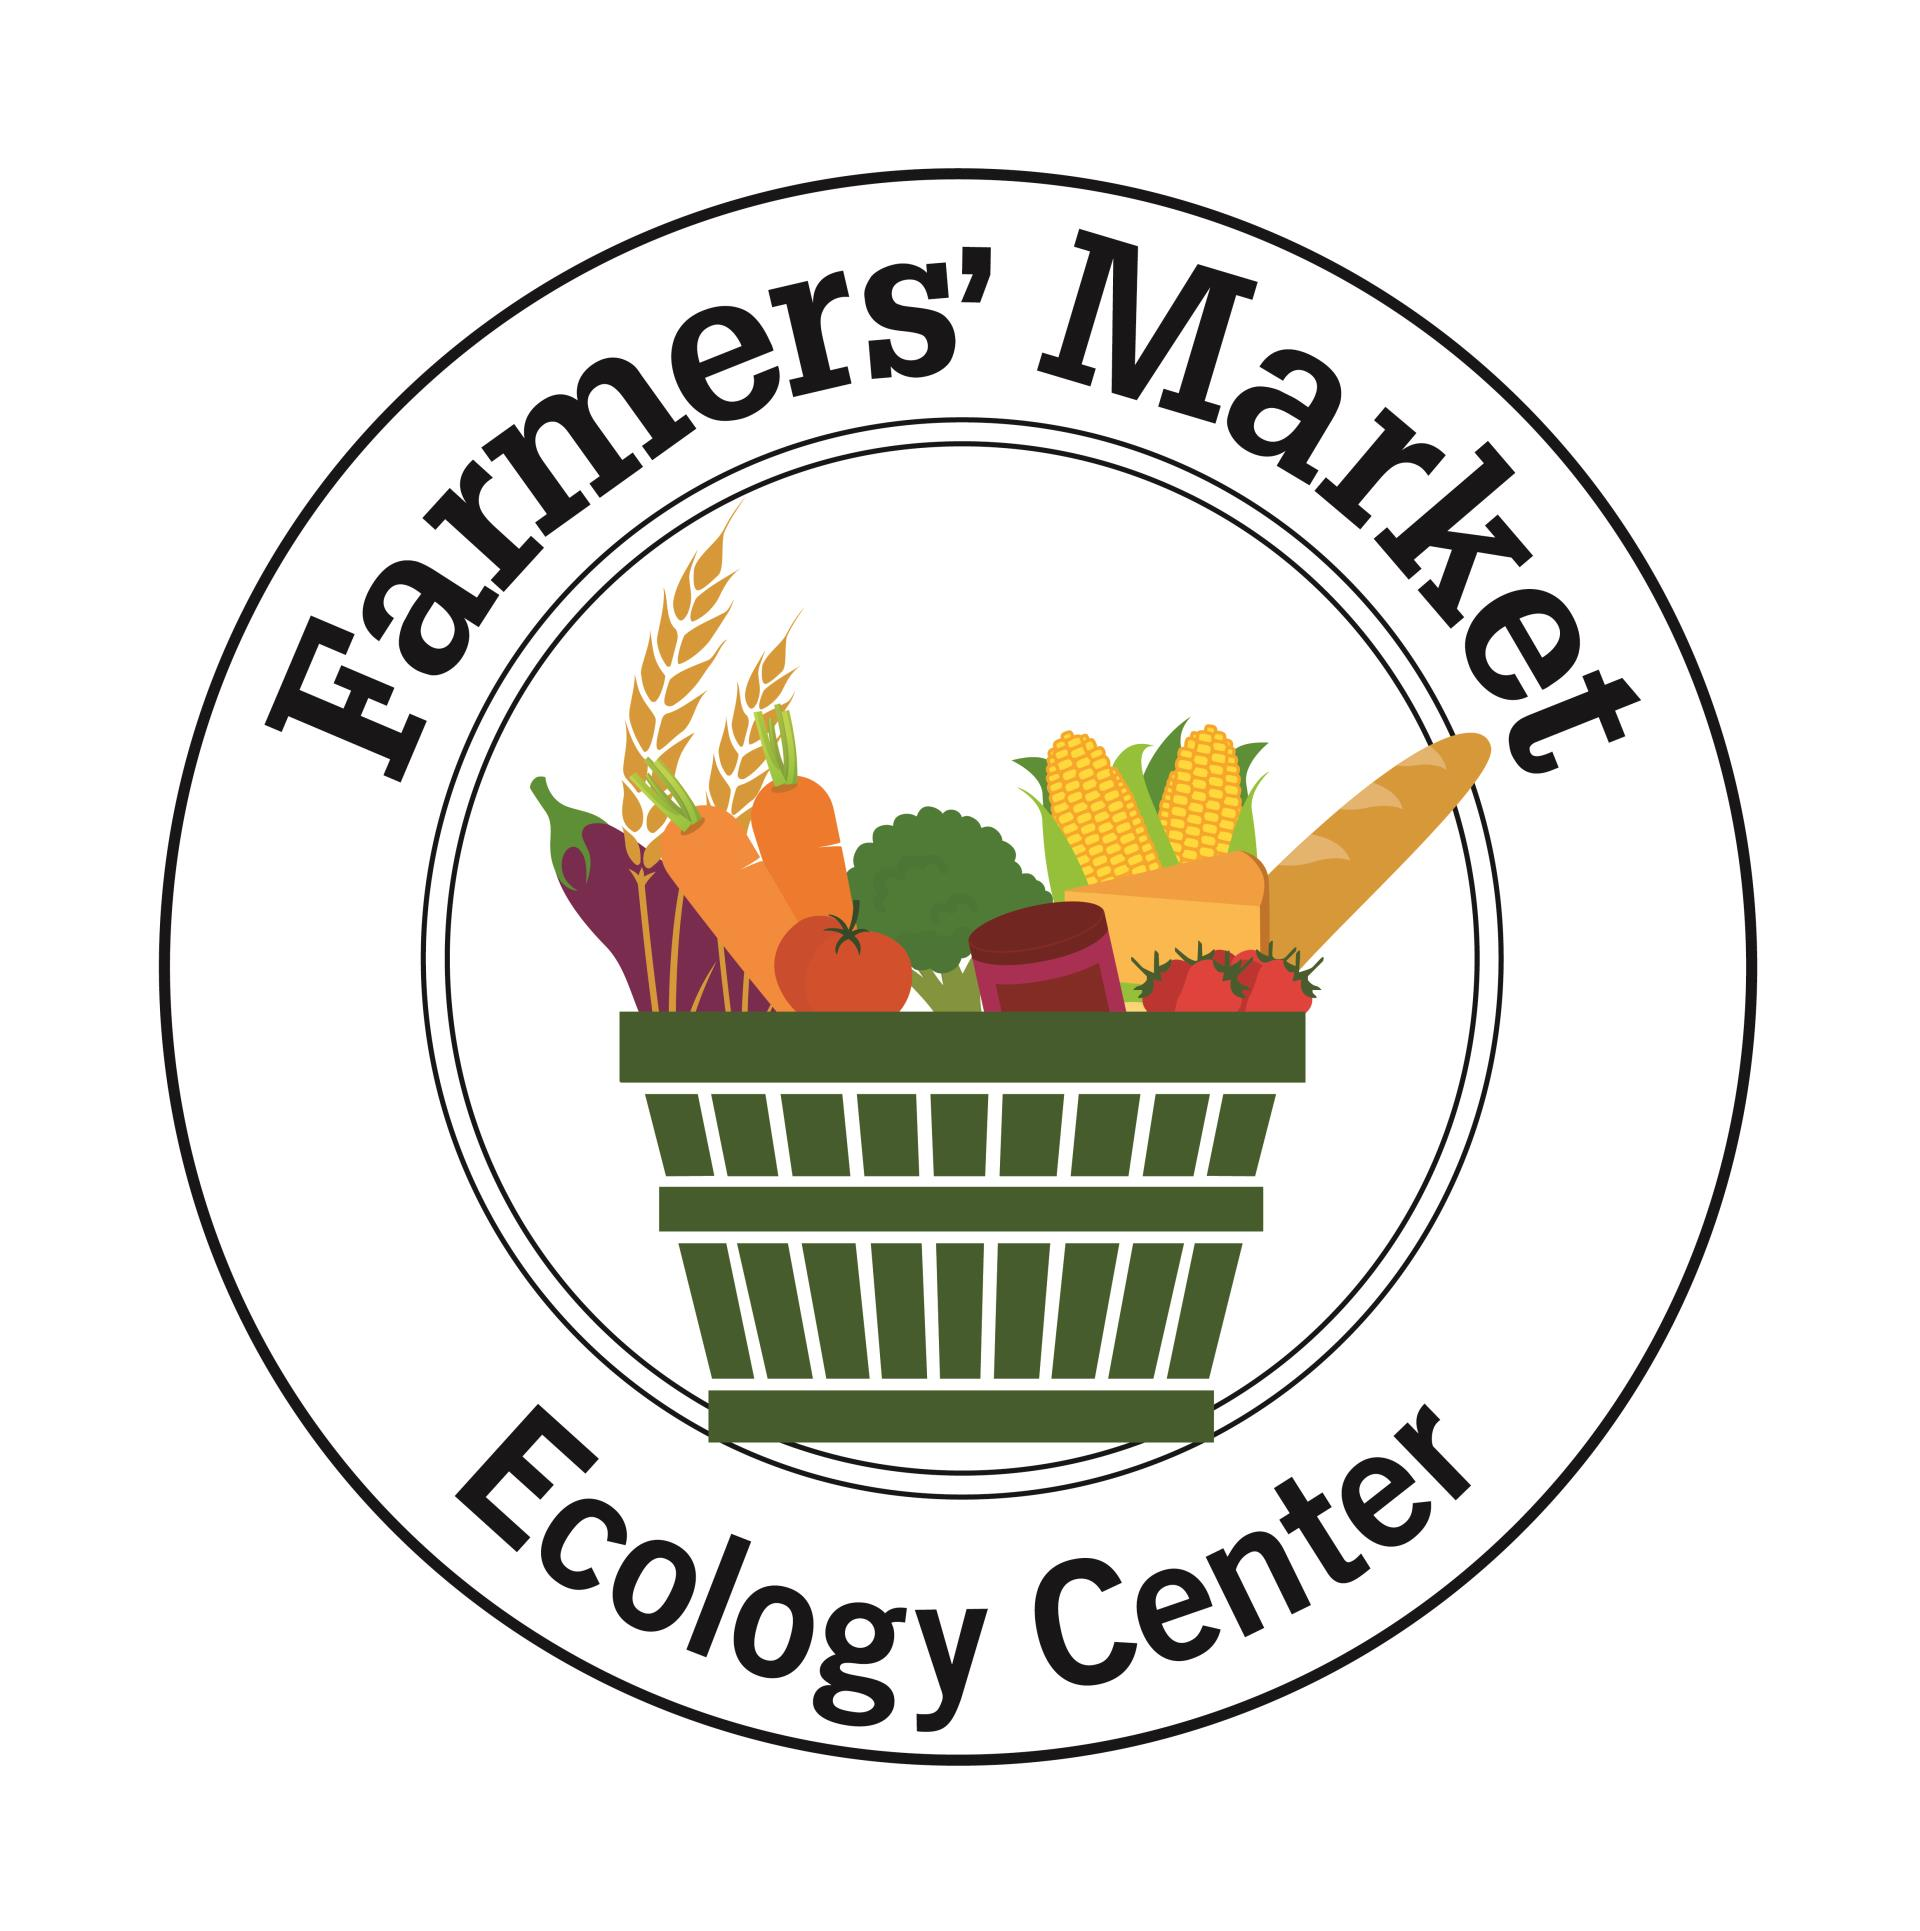 EcologyCenter_Farmers Market logo_2015_BW